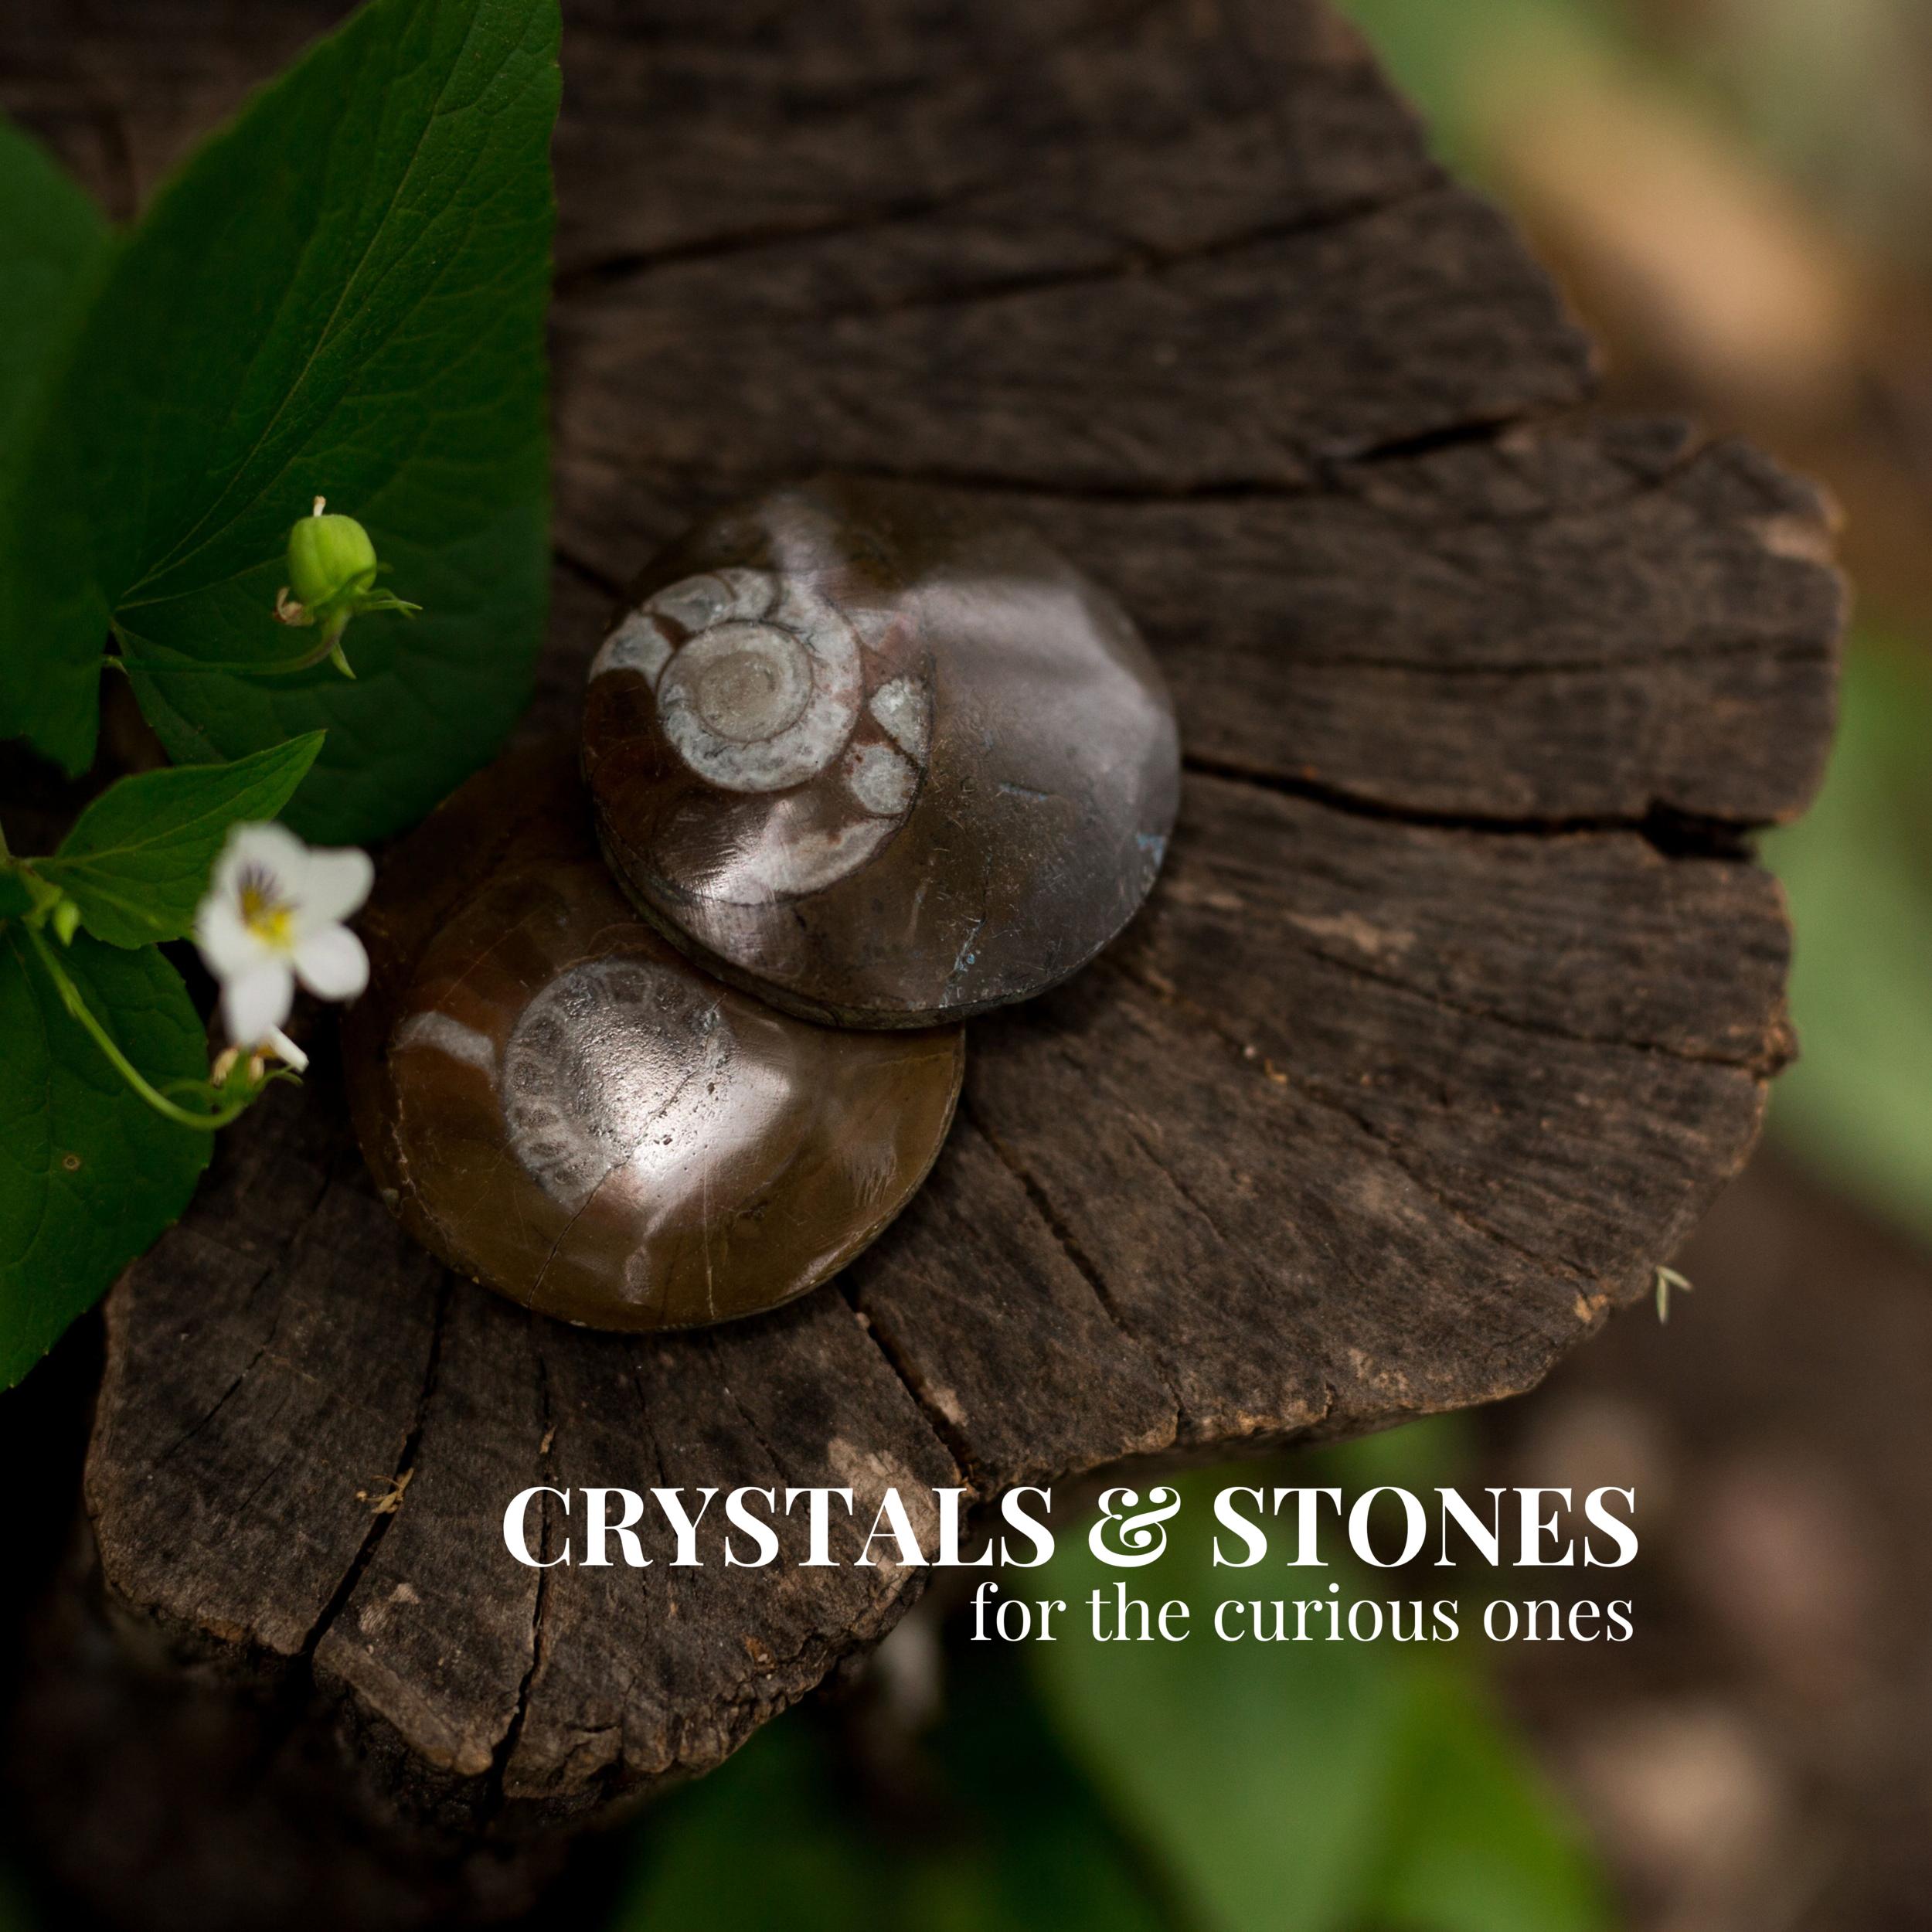 crystals & stones.png